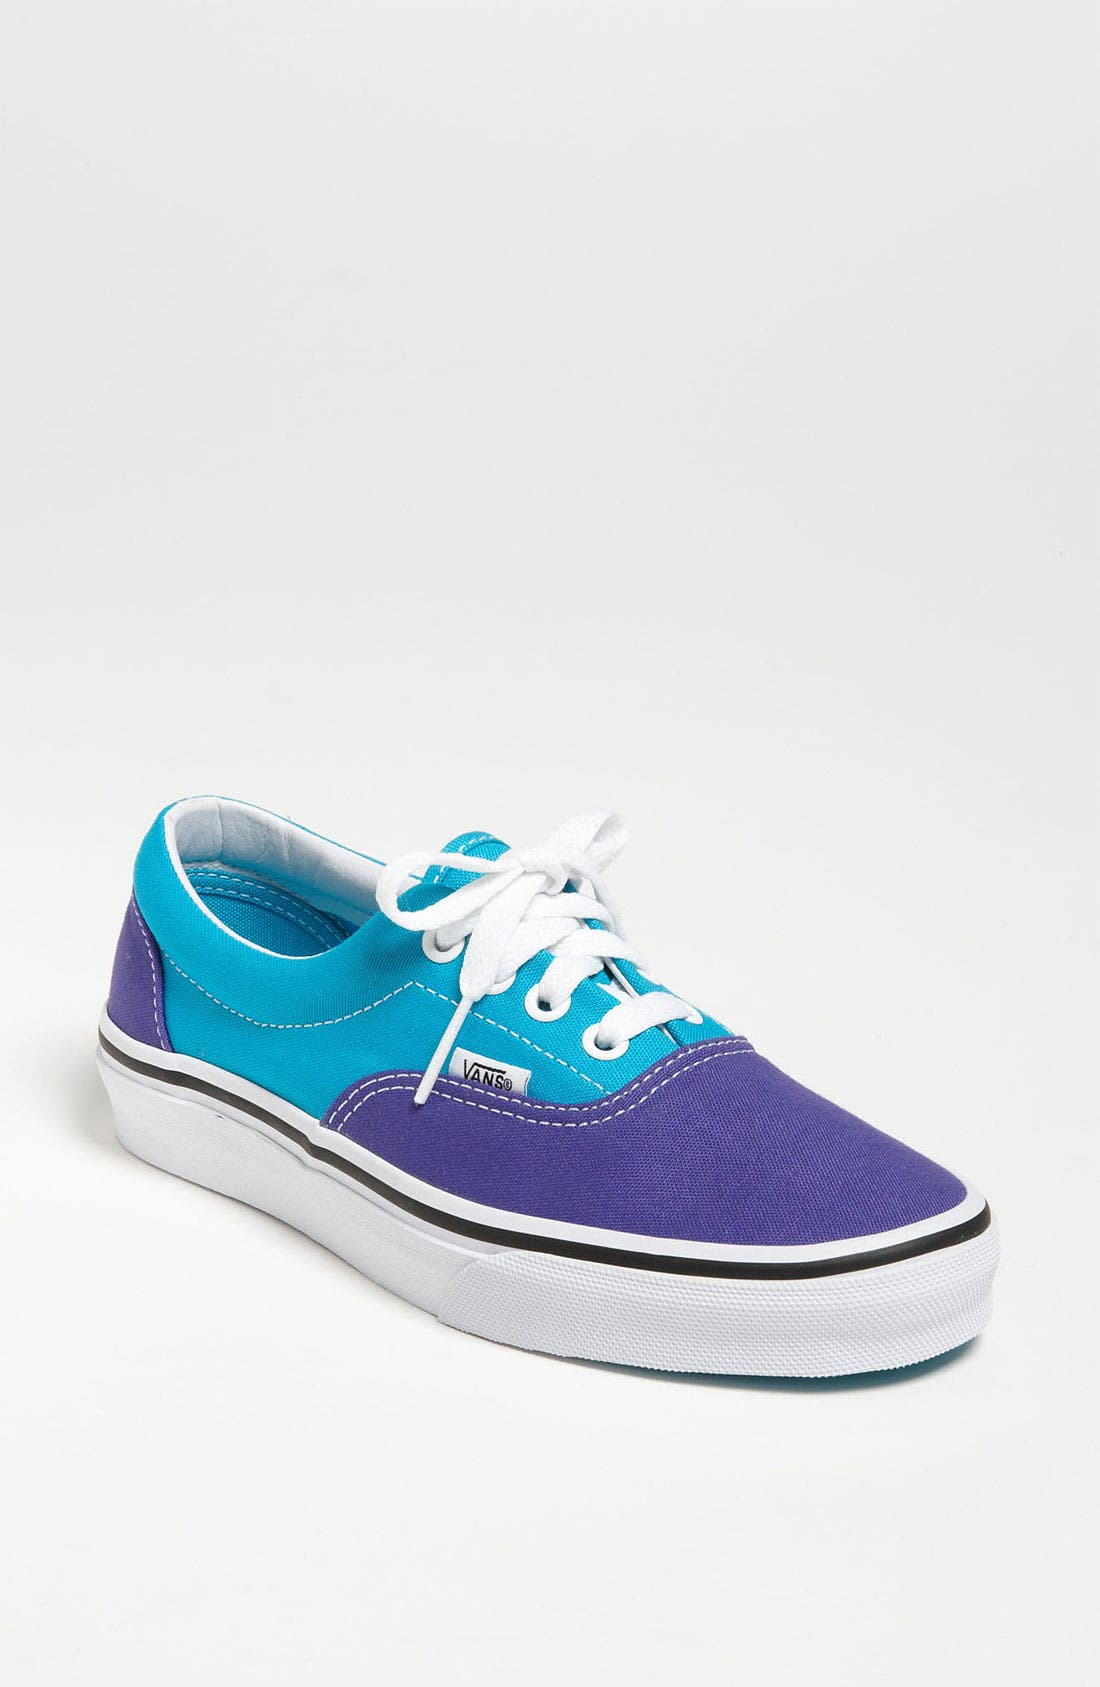 Main Image - Vans 'Era - Two Tone' Sneaker (Women)